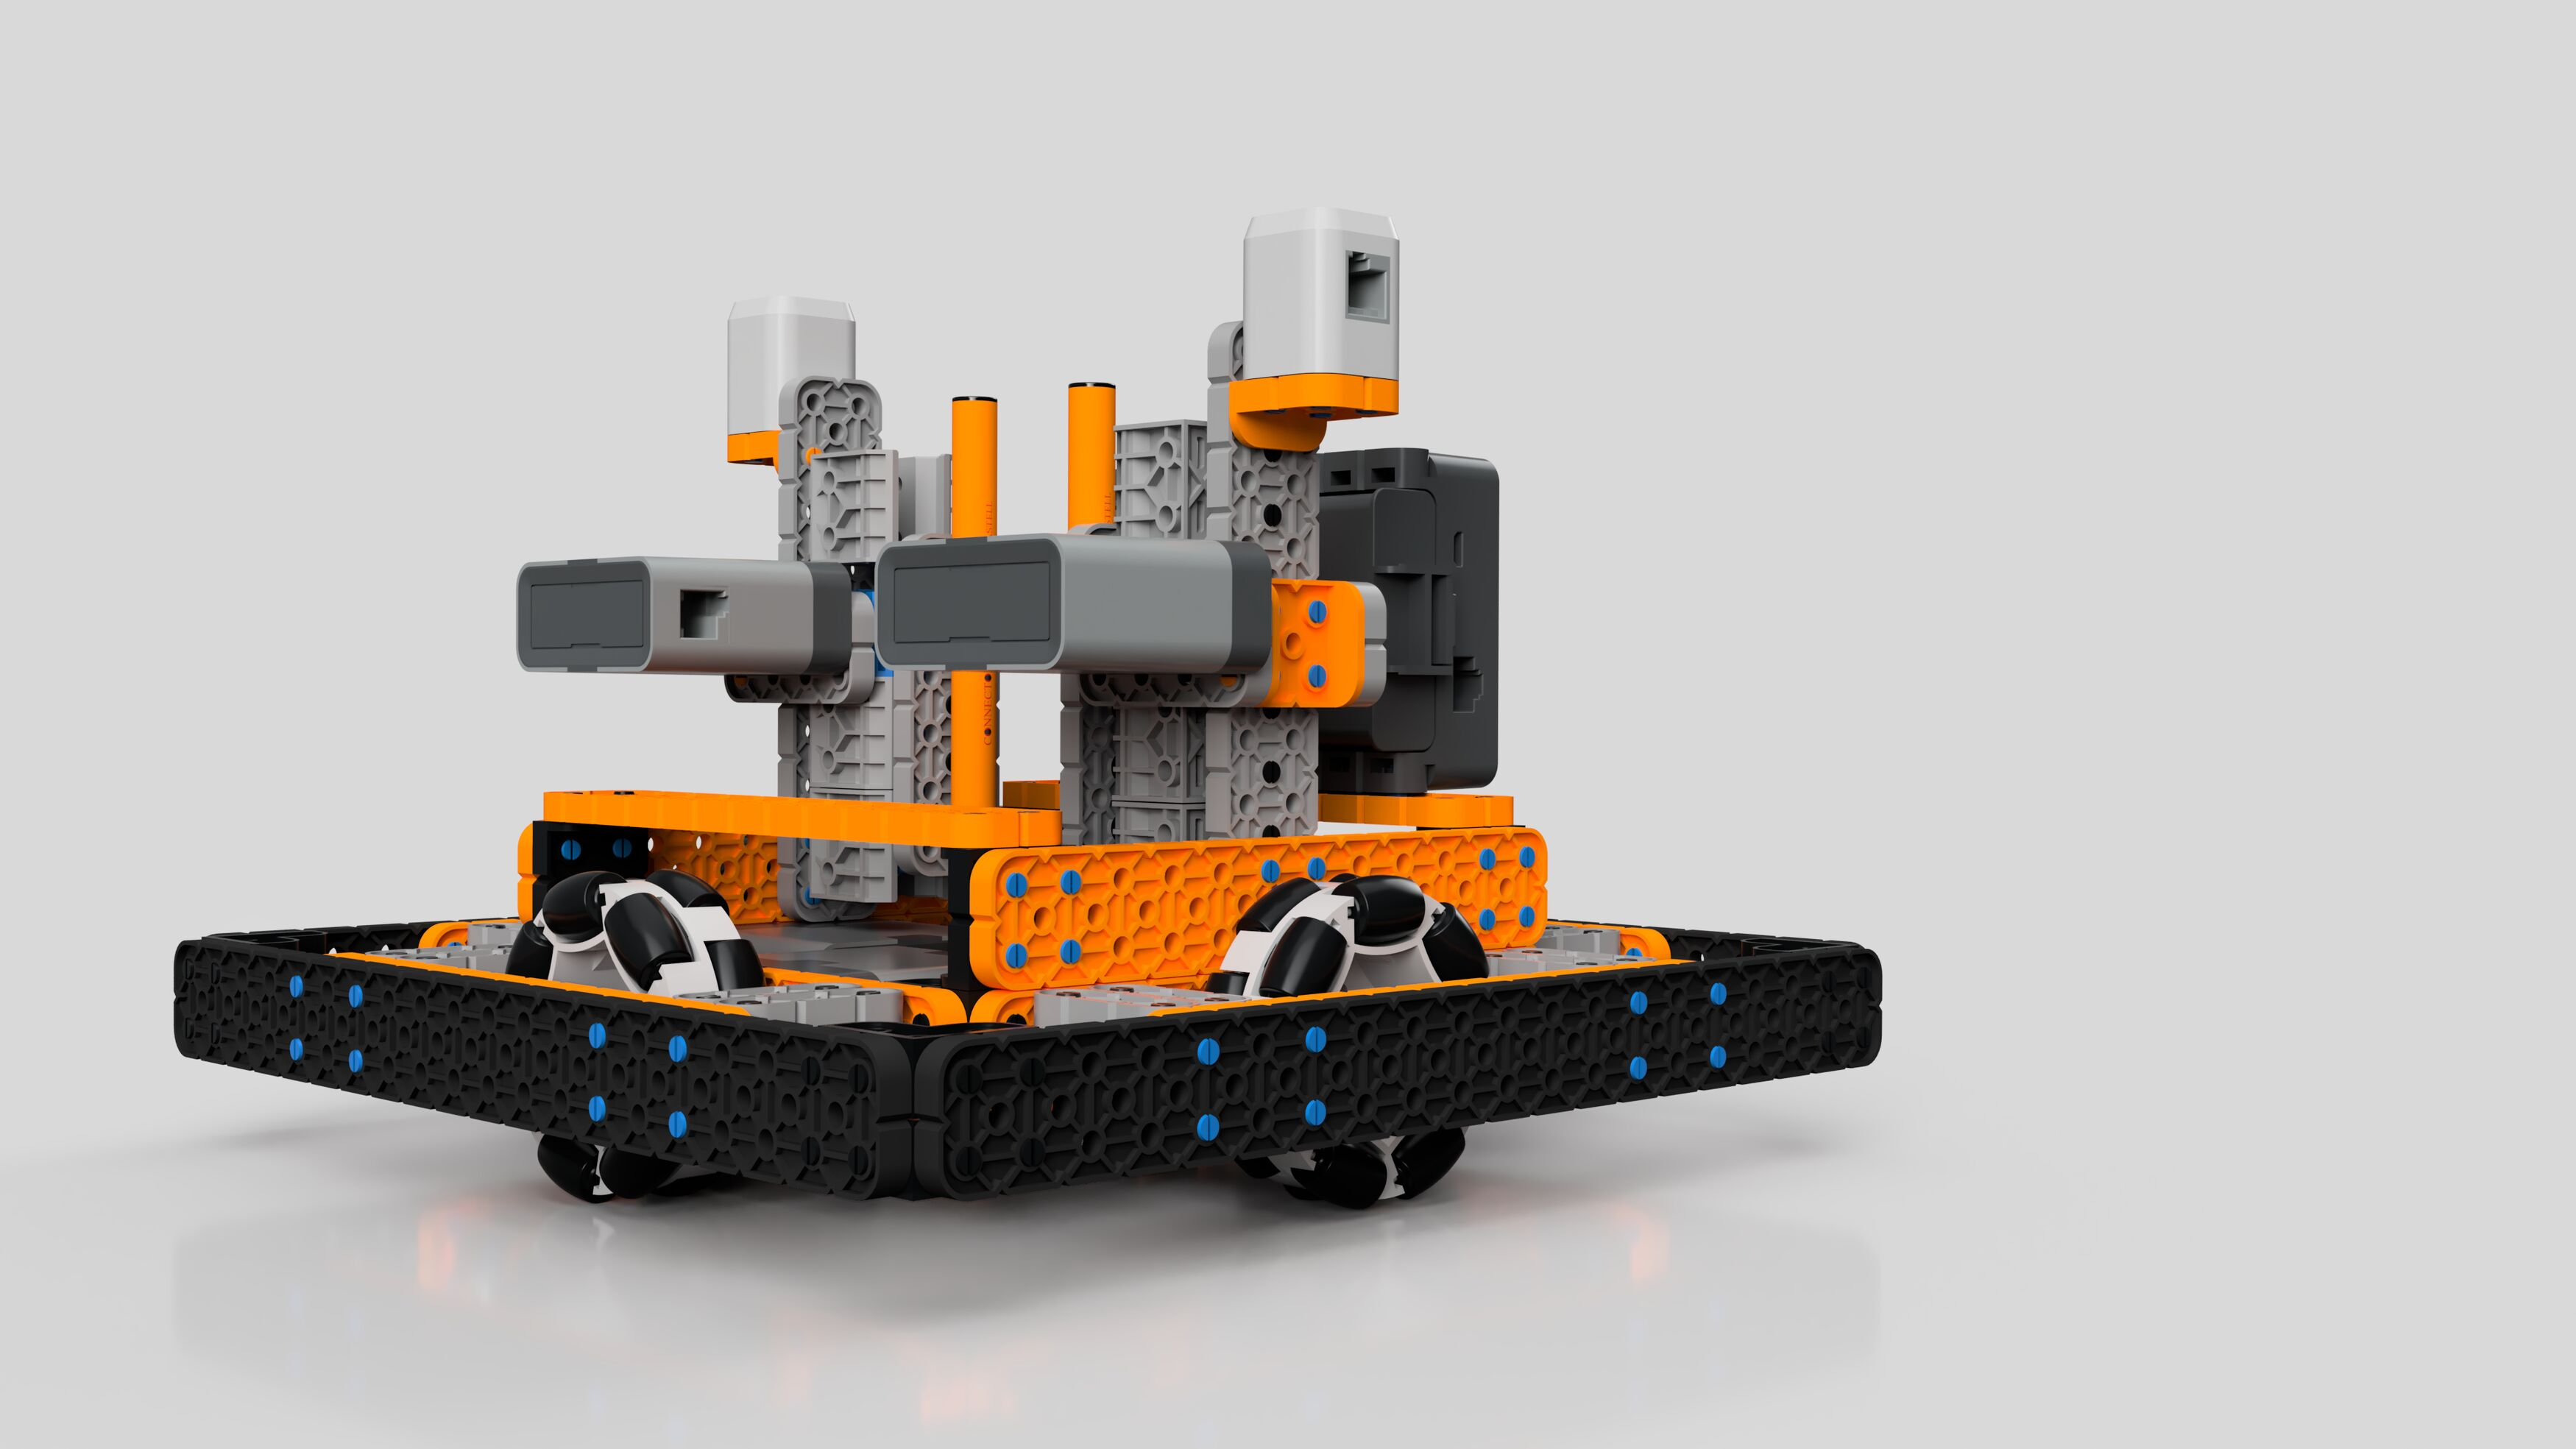 Robotics-pen-oficial-2-cores---fabrica-de-nerdes-2020-may-28-08-06-09pm-000-customizedview15973897733-png-3500-3500